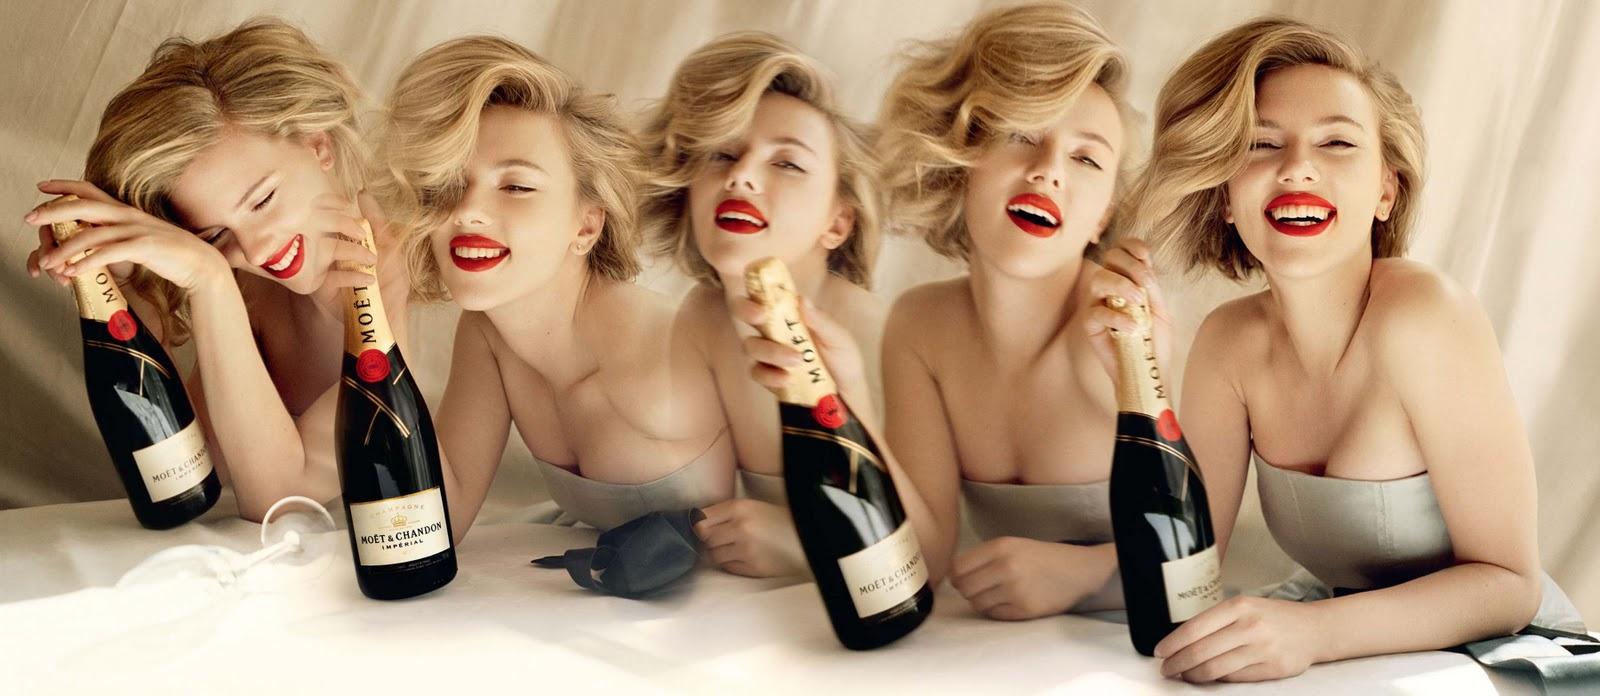 Scarlett-Johansson-11